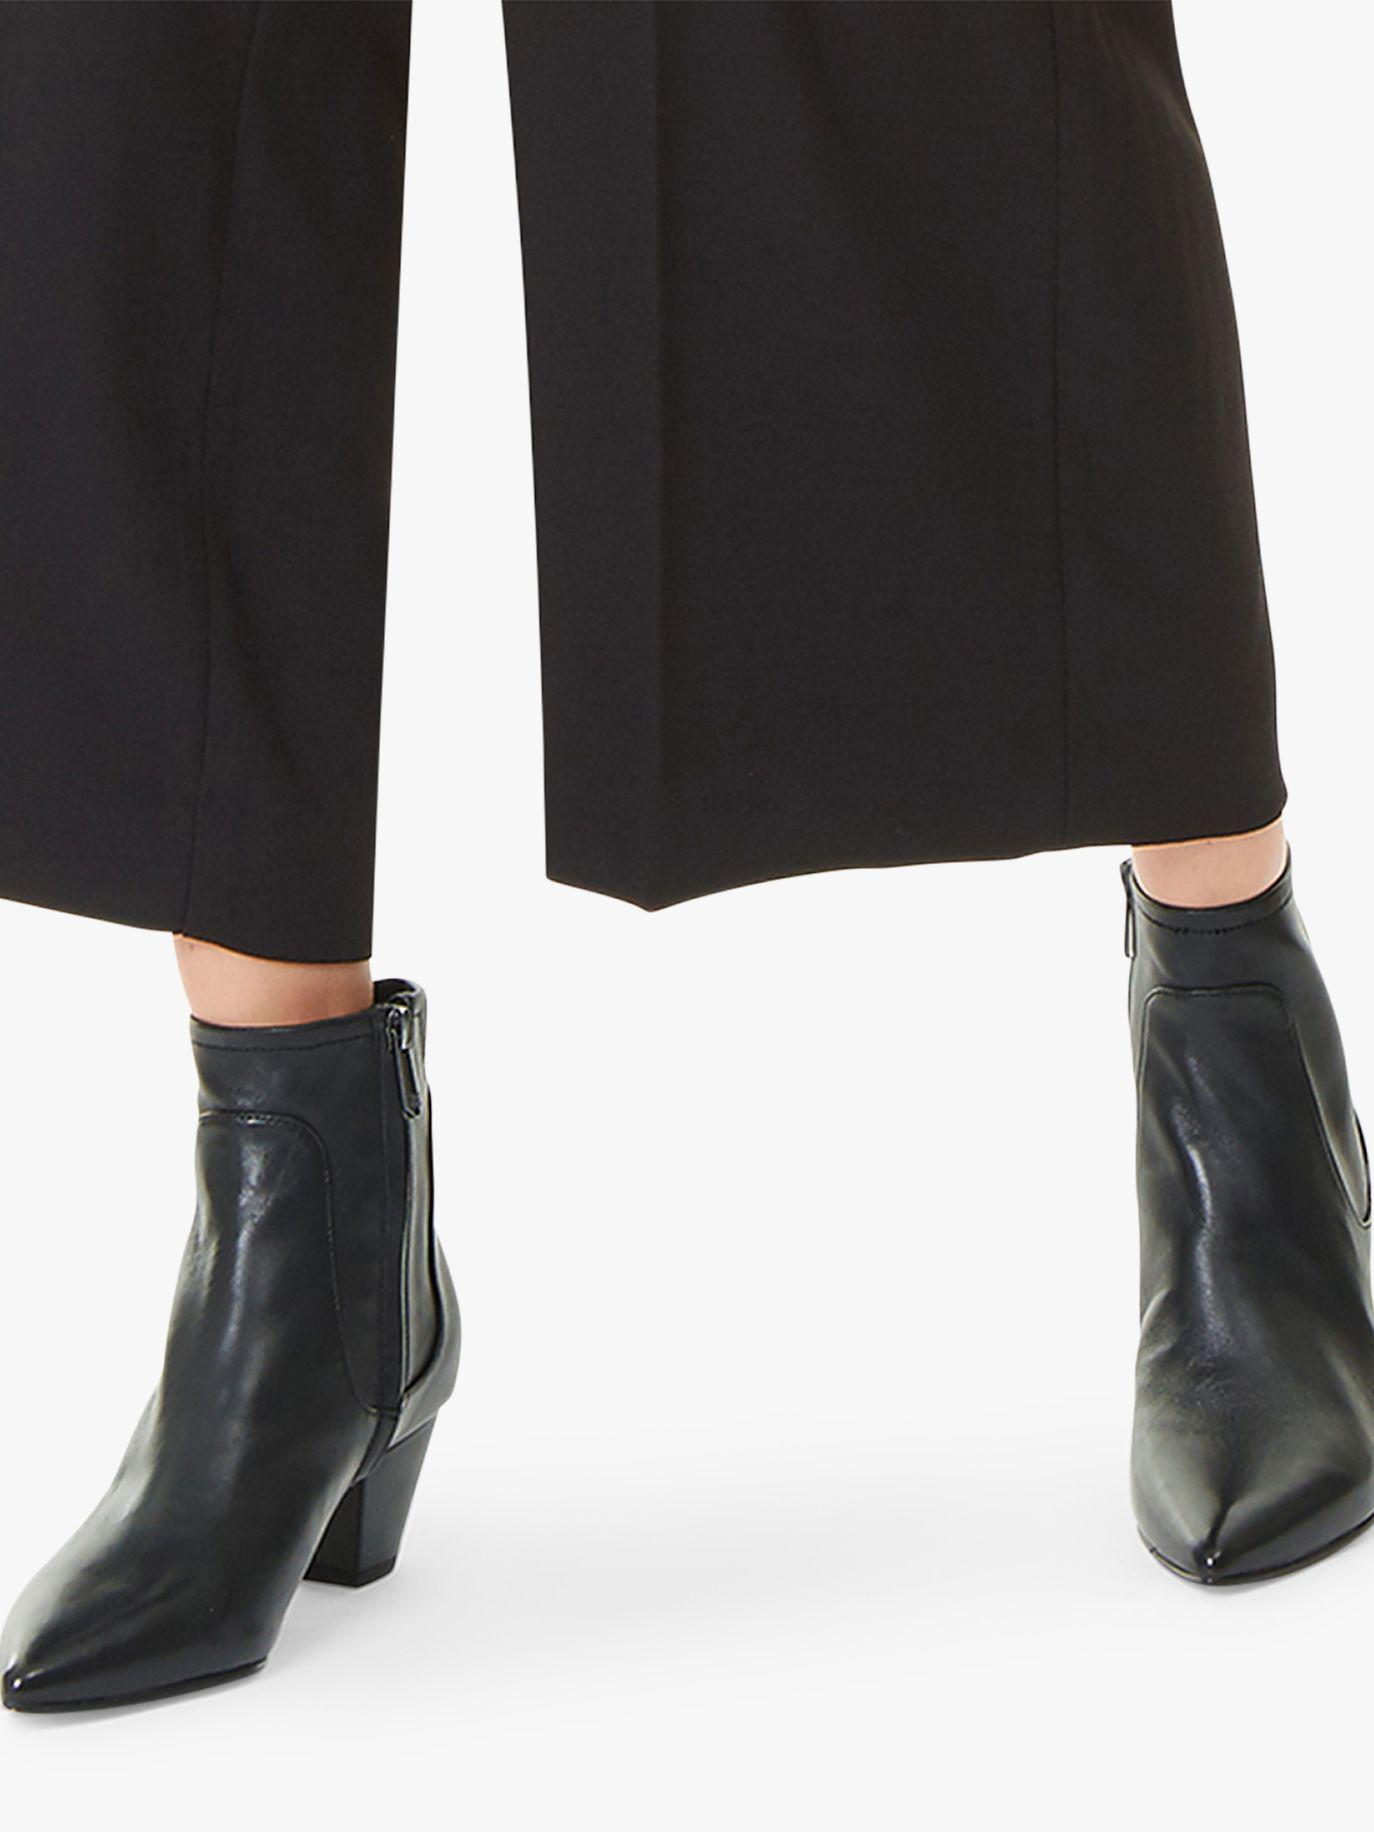 256c65b0cf0187 Sam Edelman Karlee Ankle Boots in Black - Save 65% - Lyst